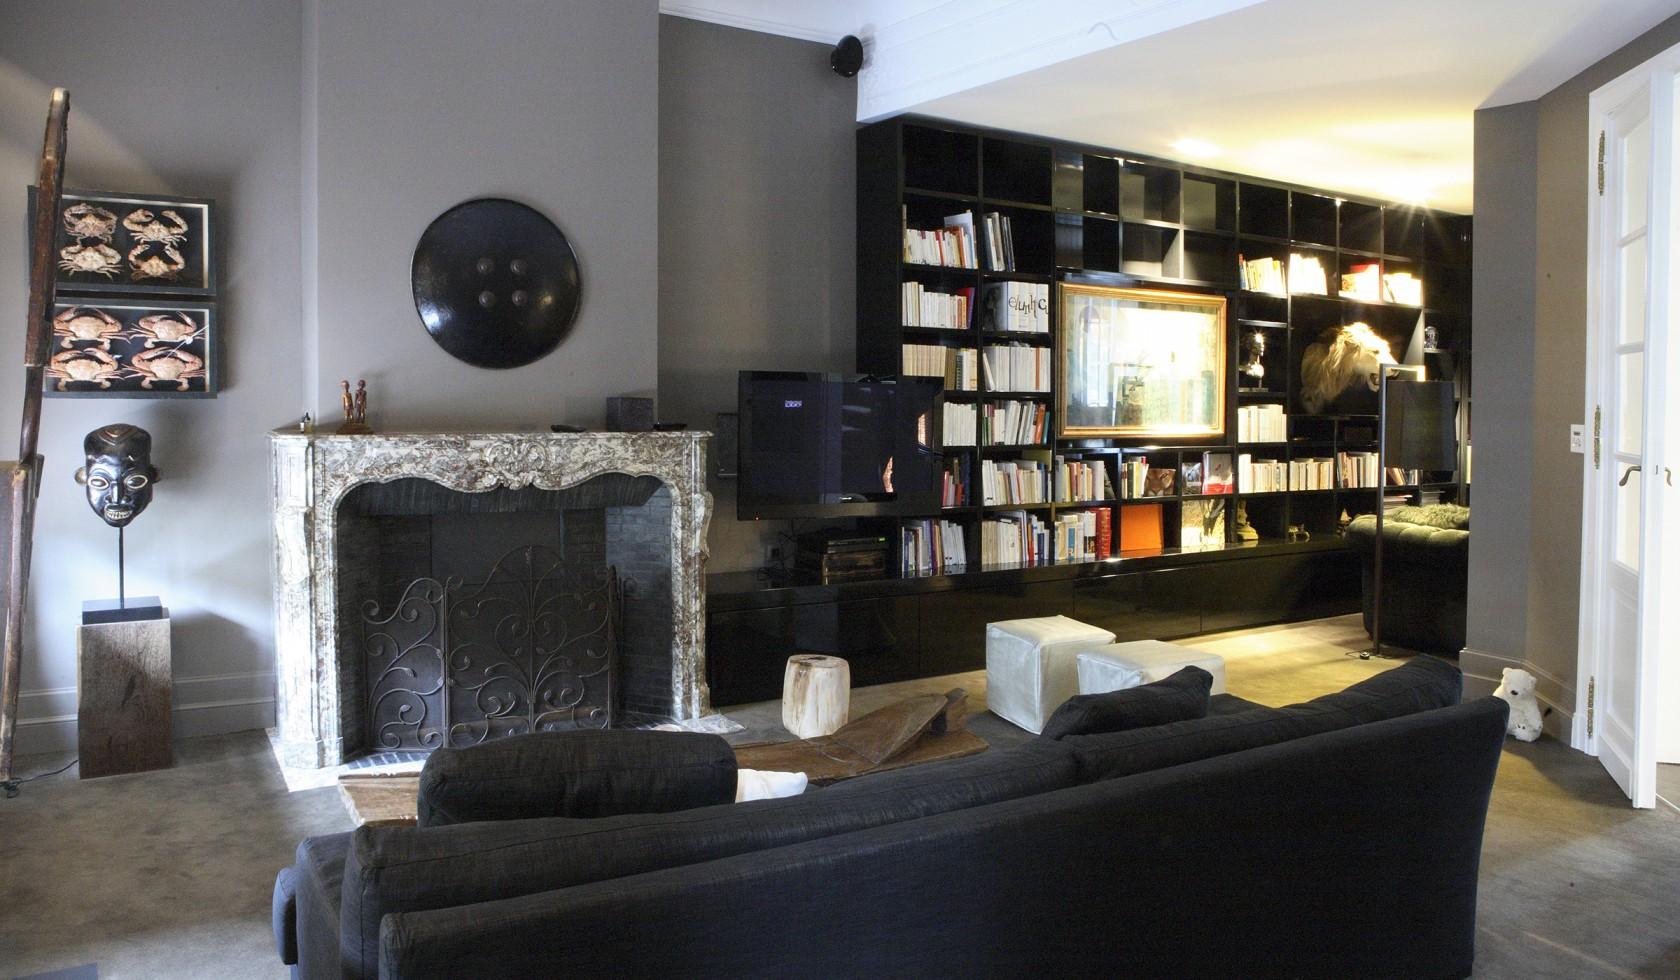 hotel particulier bruxelles belgique guillaume da silva. Black Bedroom Furniture Sets. Home Design Ideas